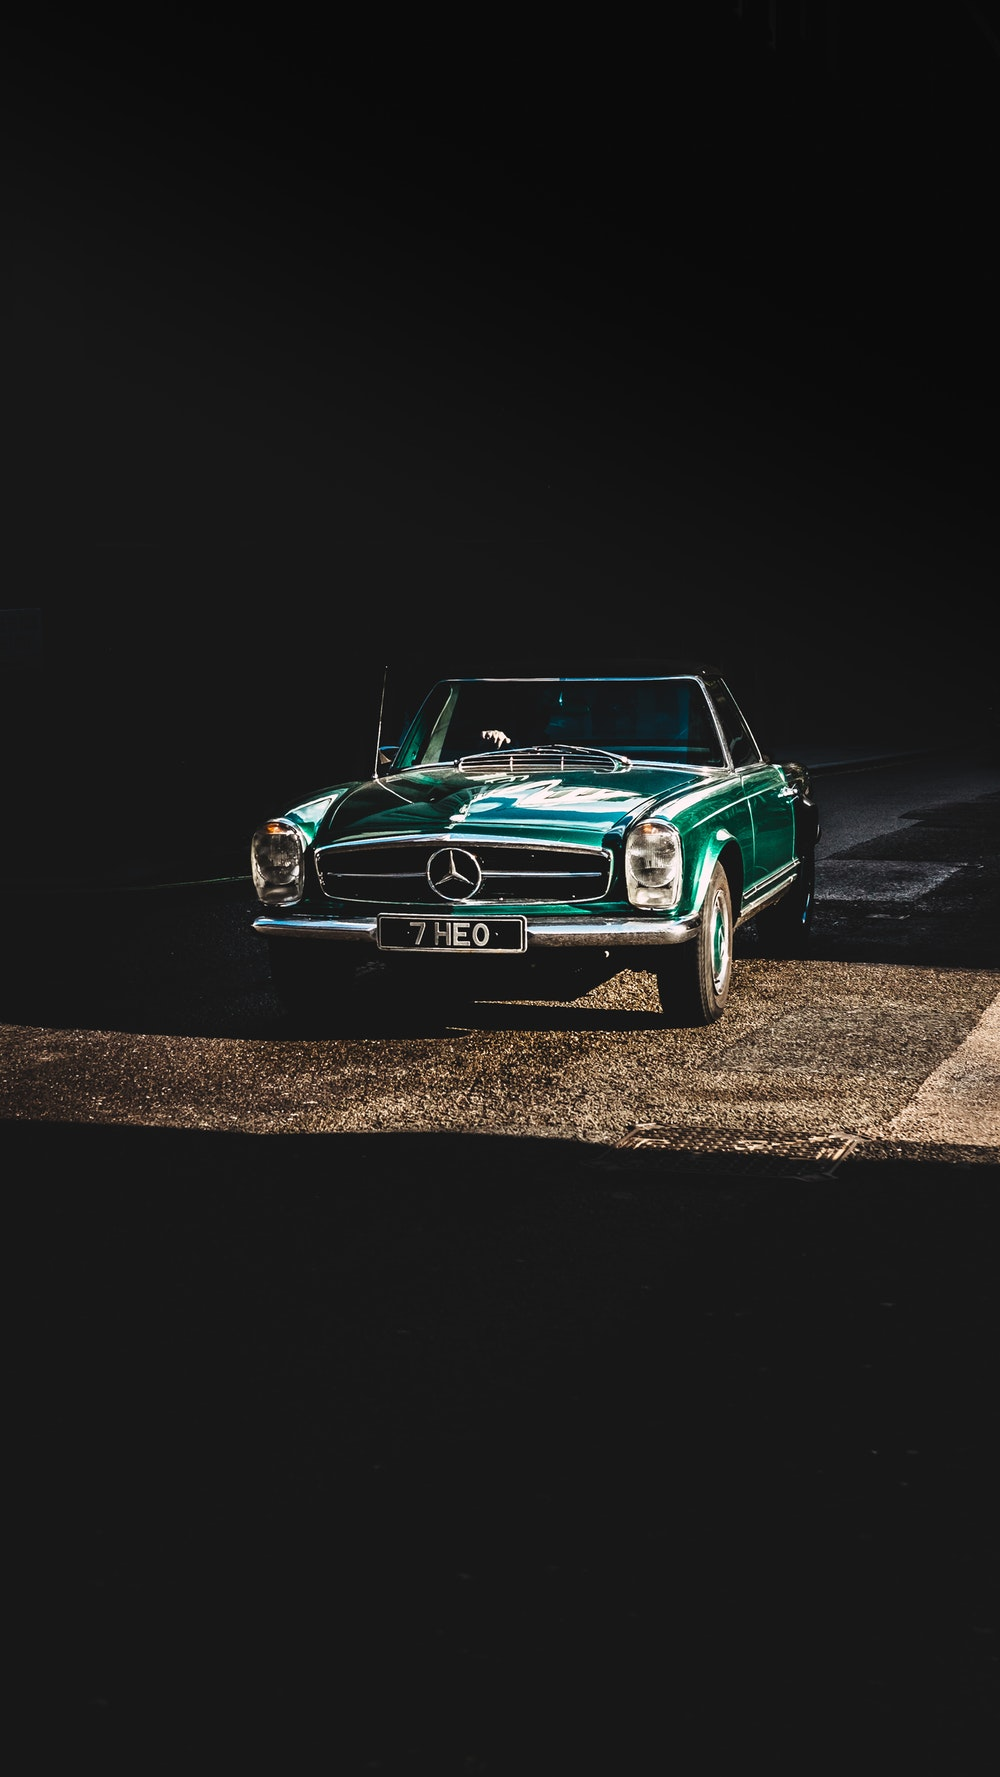 Classic Car Wallpaper Iphone 1000x1777 Wallpaper Teahub Io